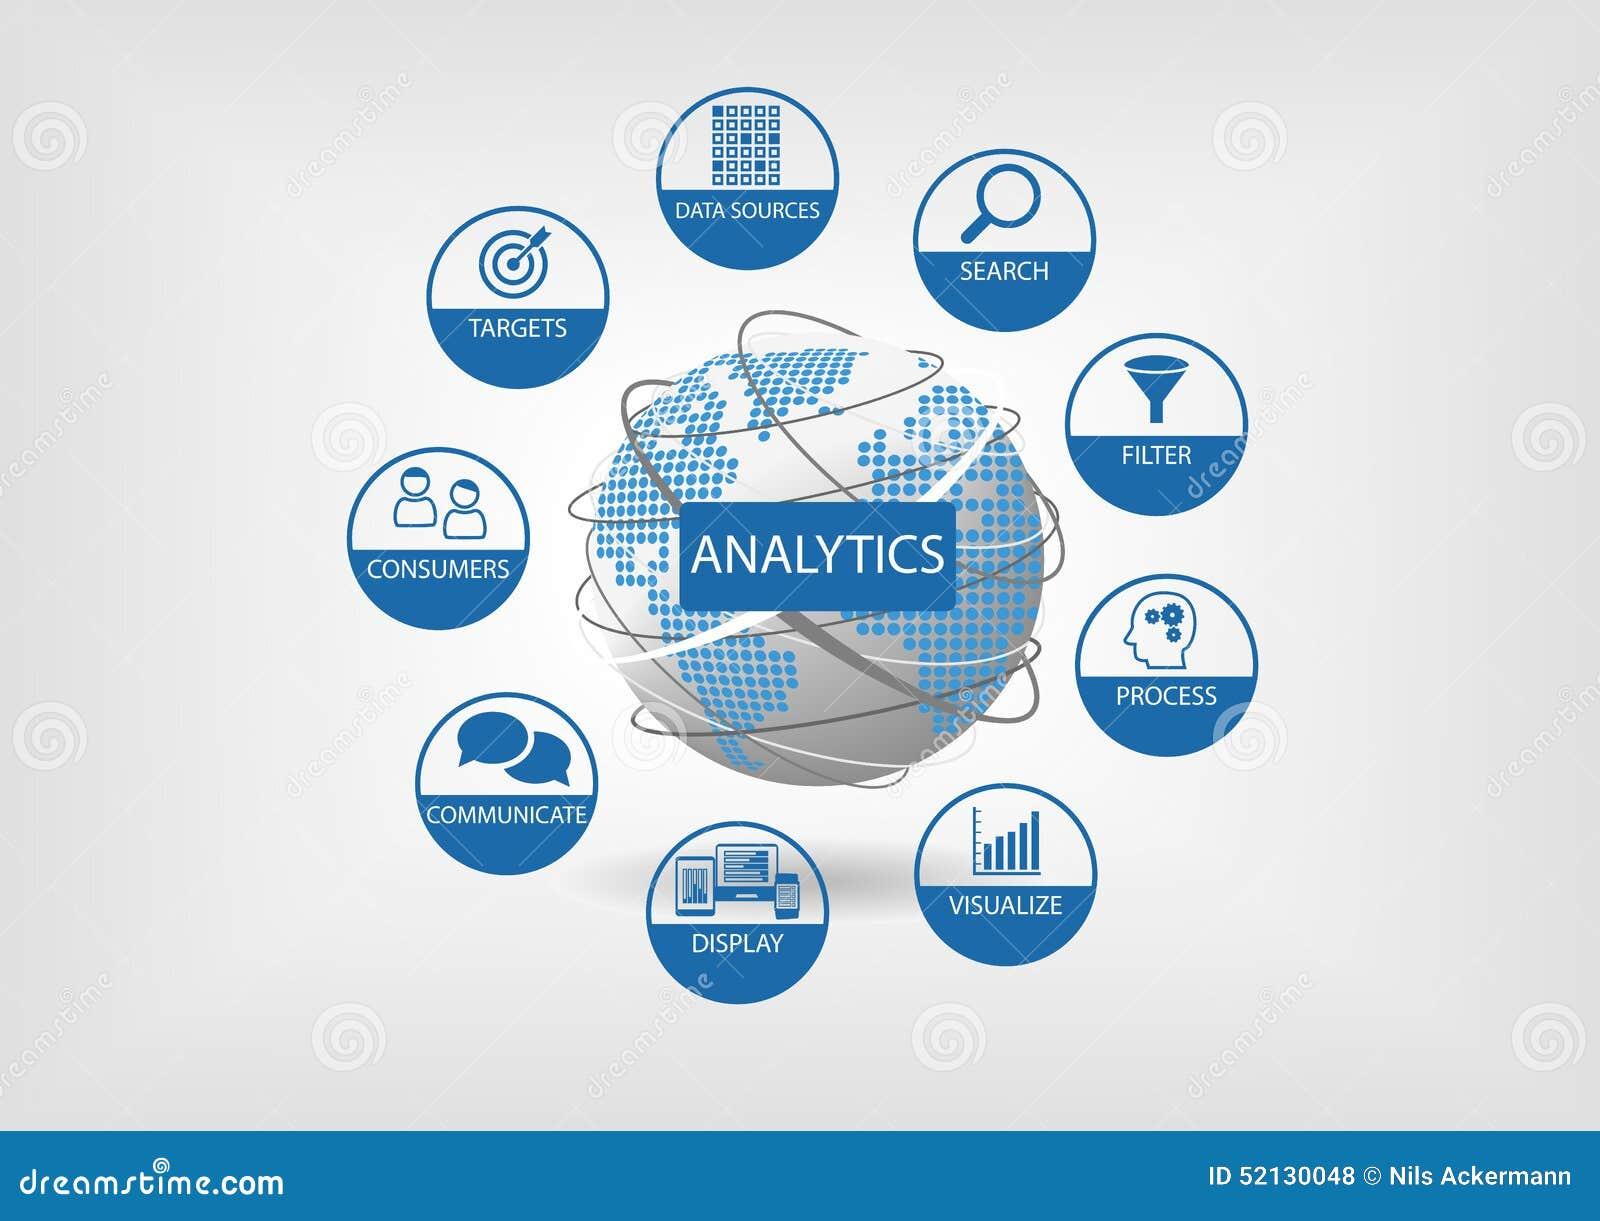 epub Automotive informatics and